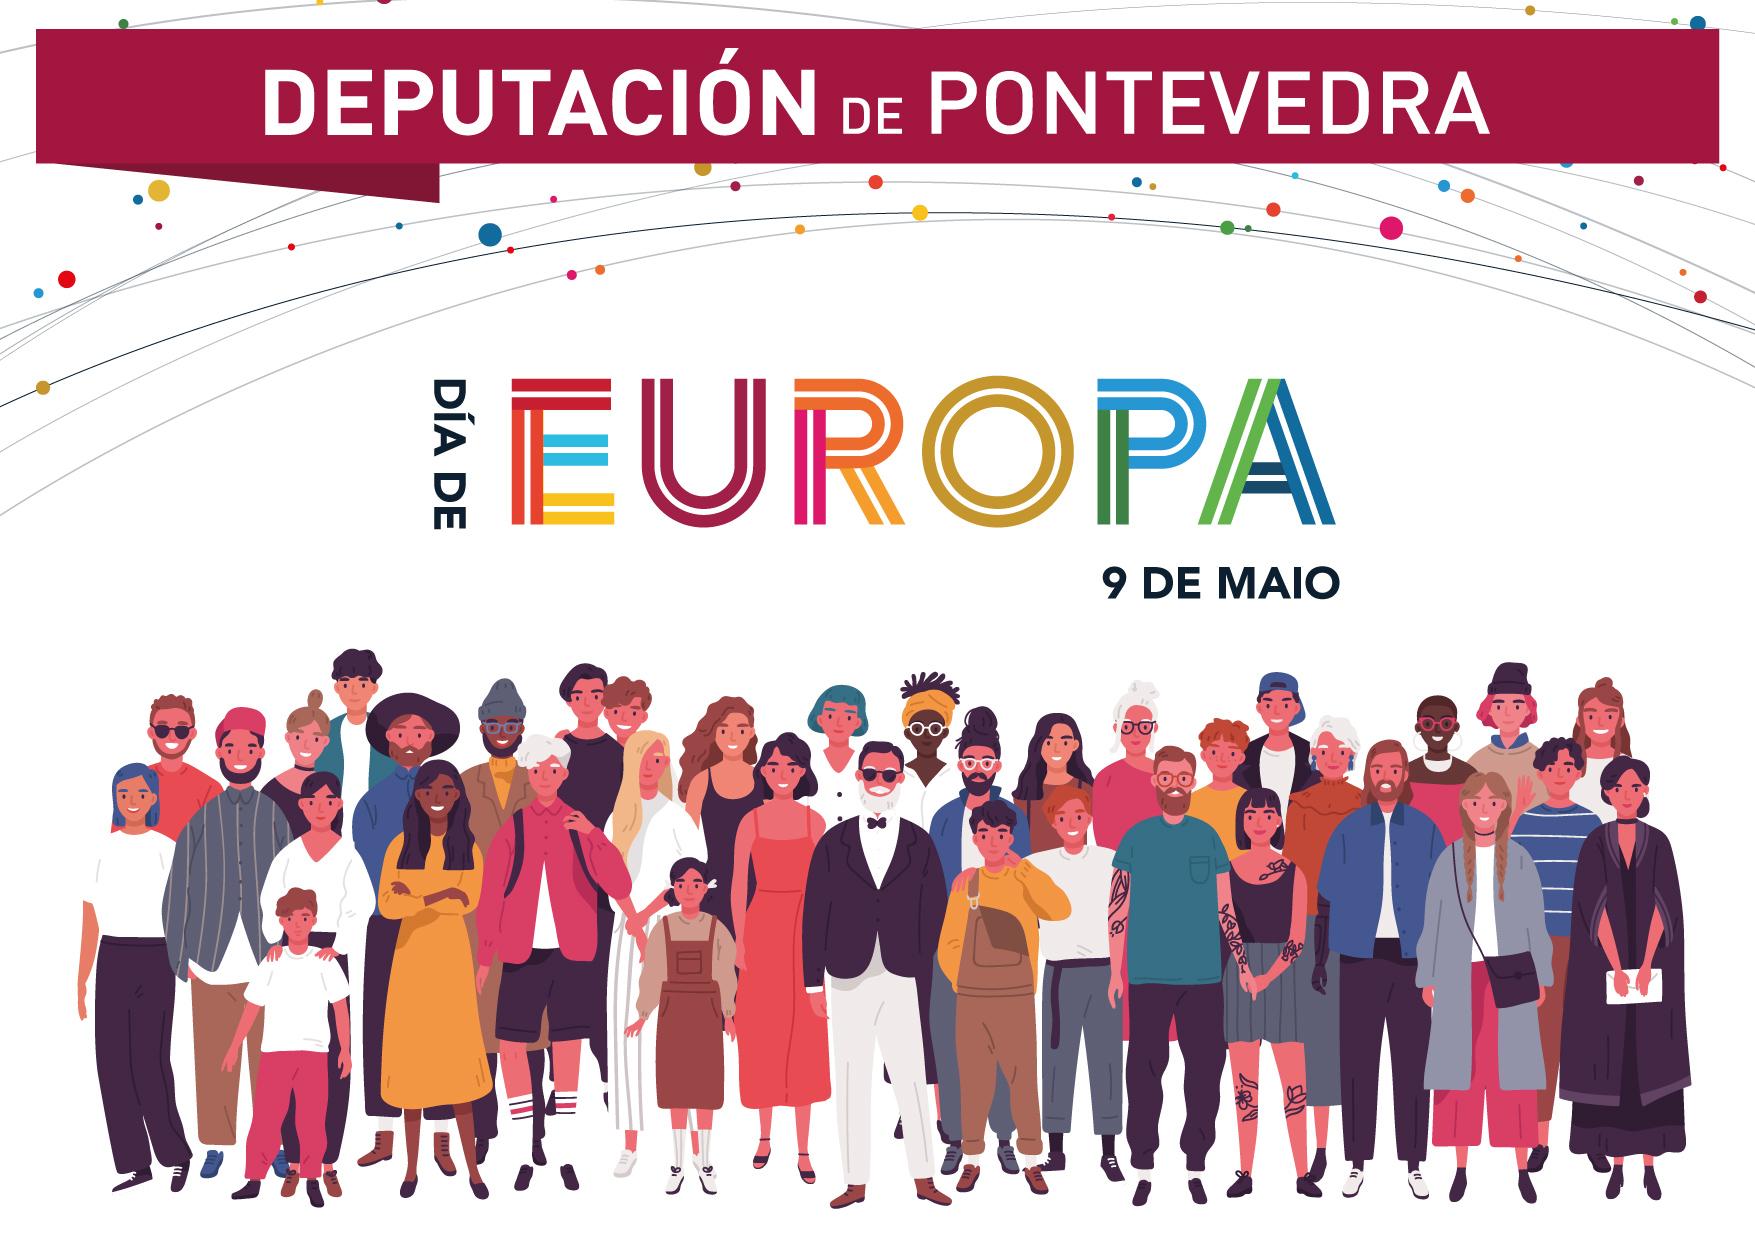 Deputación de Pontevedra día de europa